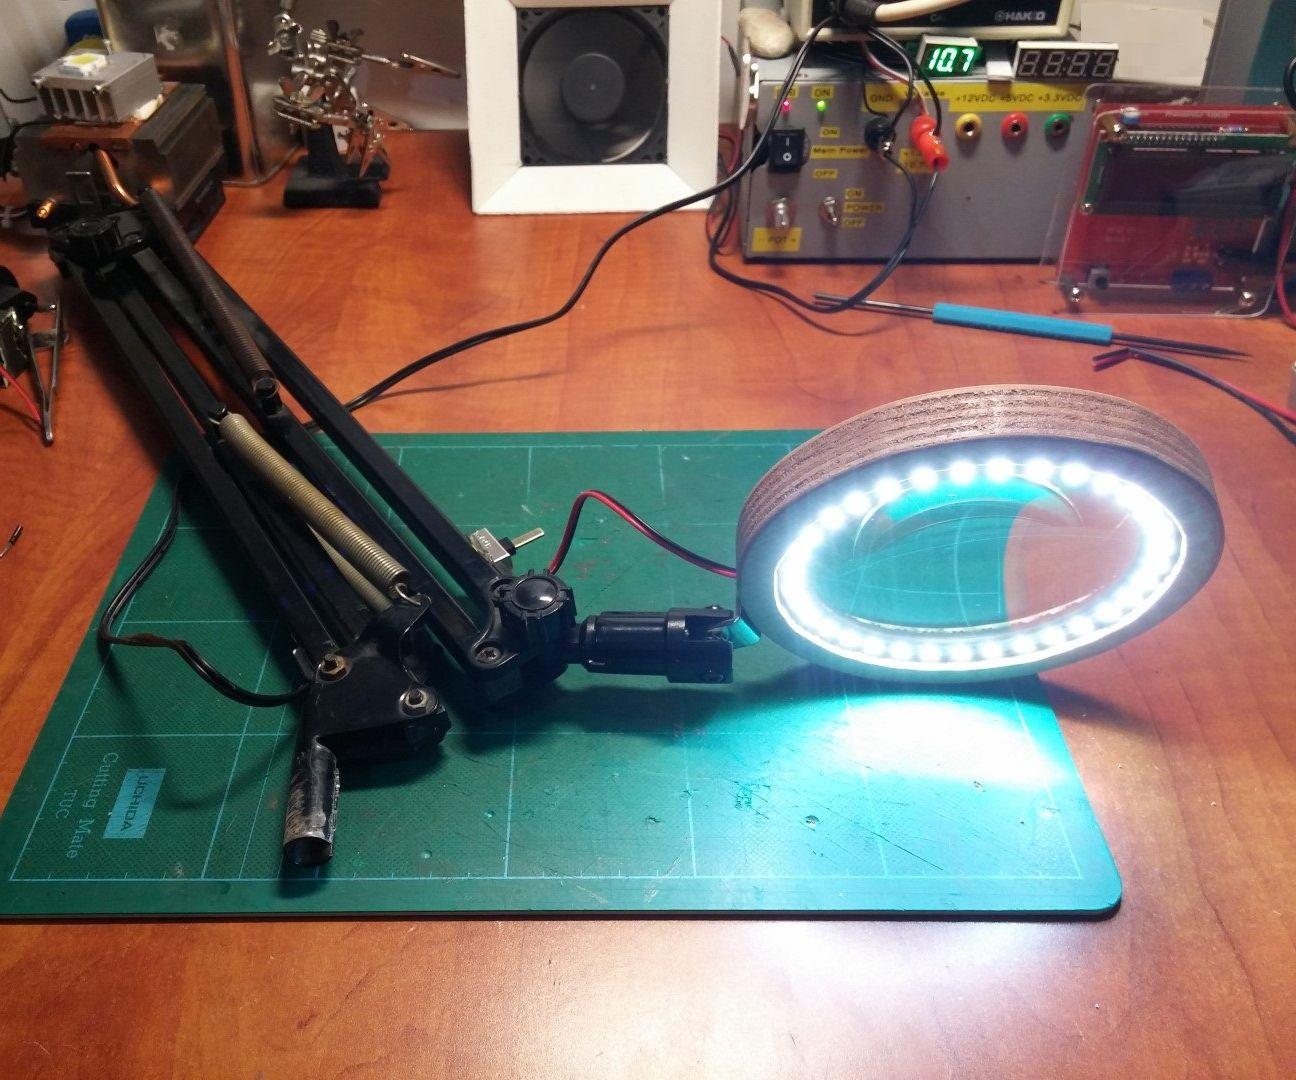 DIY Desktop LED Magnifier Lamp : 8 Steps (with Pictures